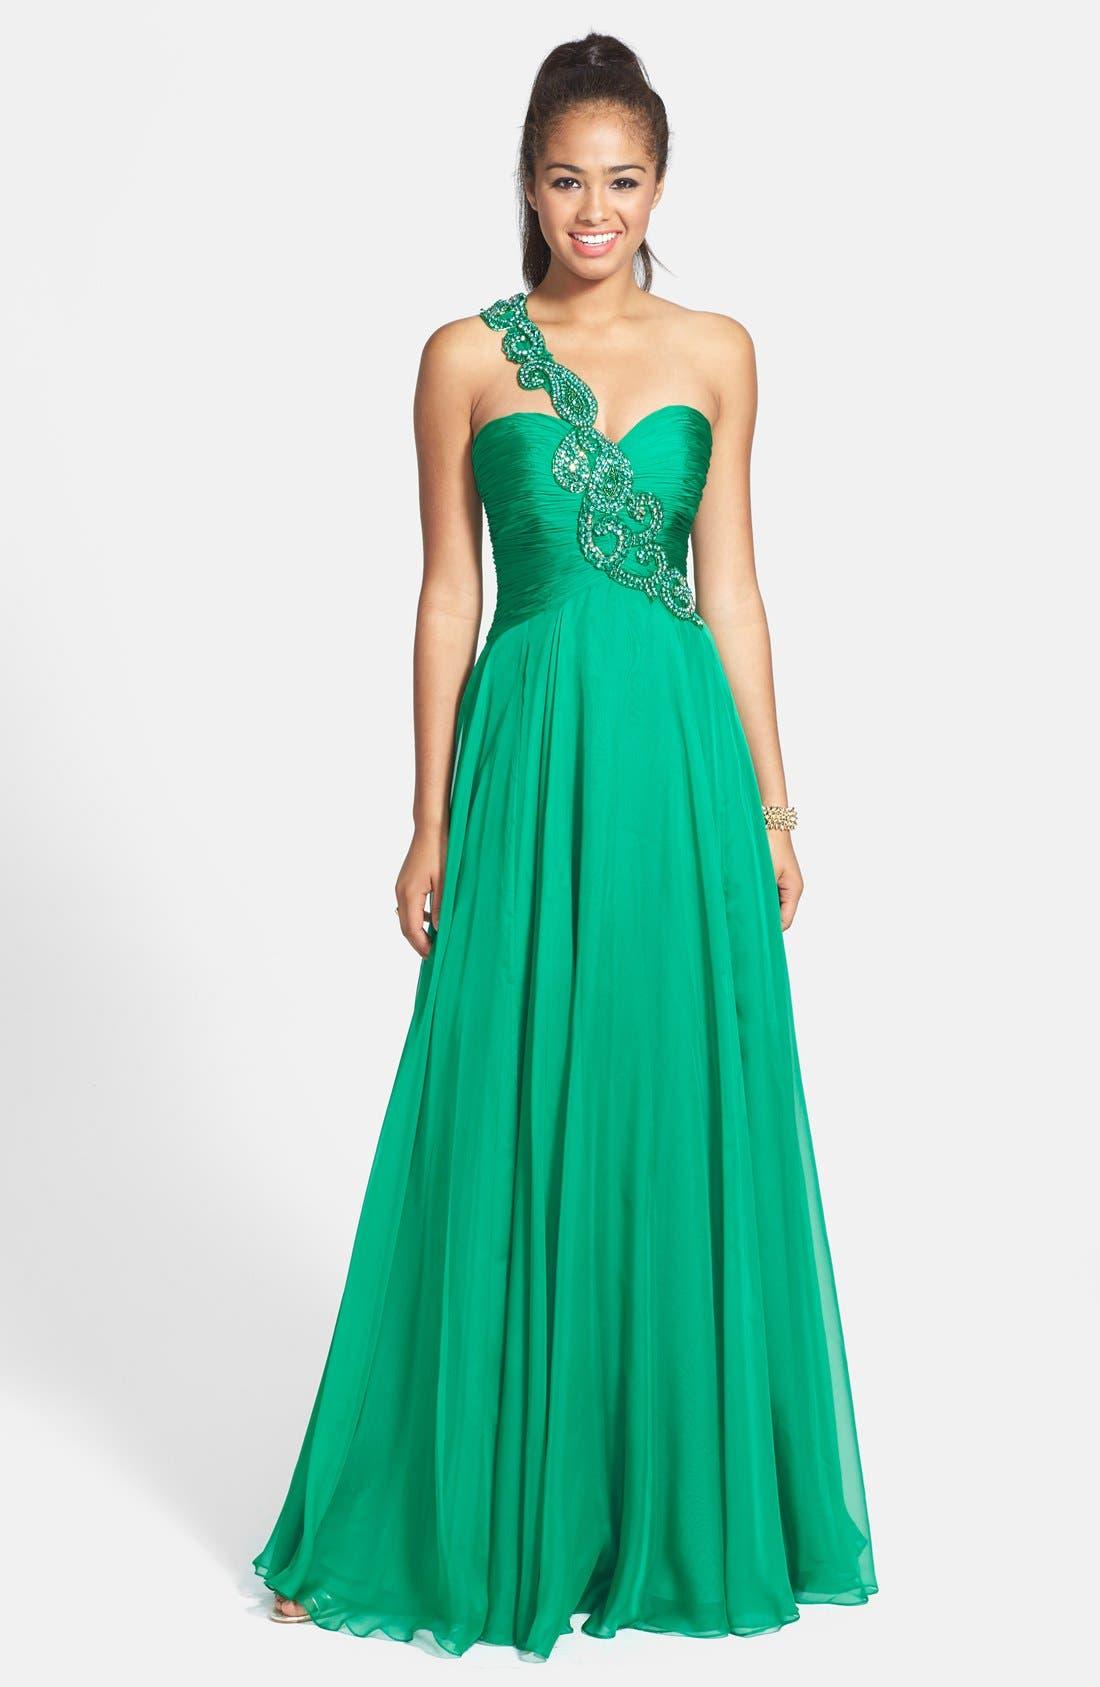 Main Image - Sherri Hill One Shoulder Embellished Chiffon Gown